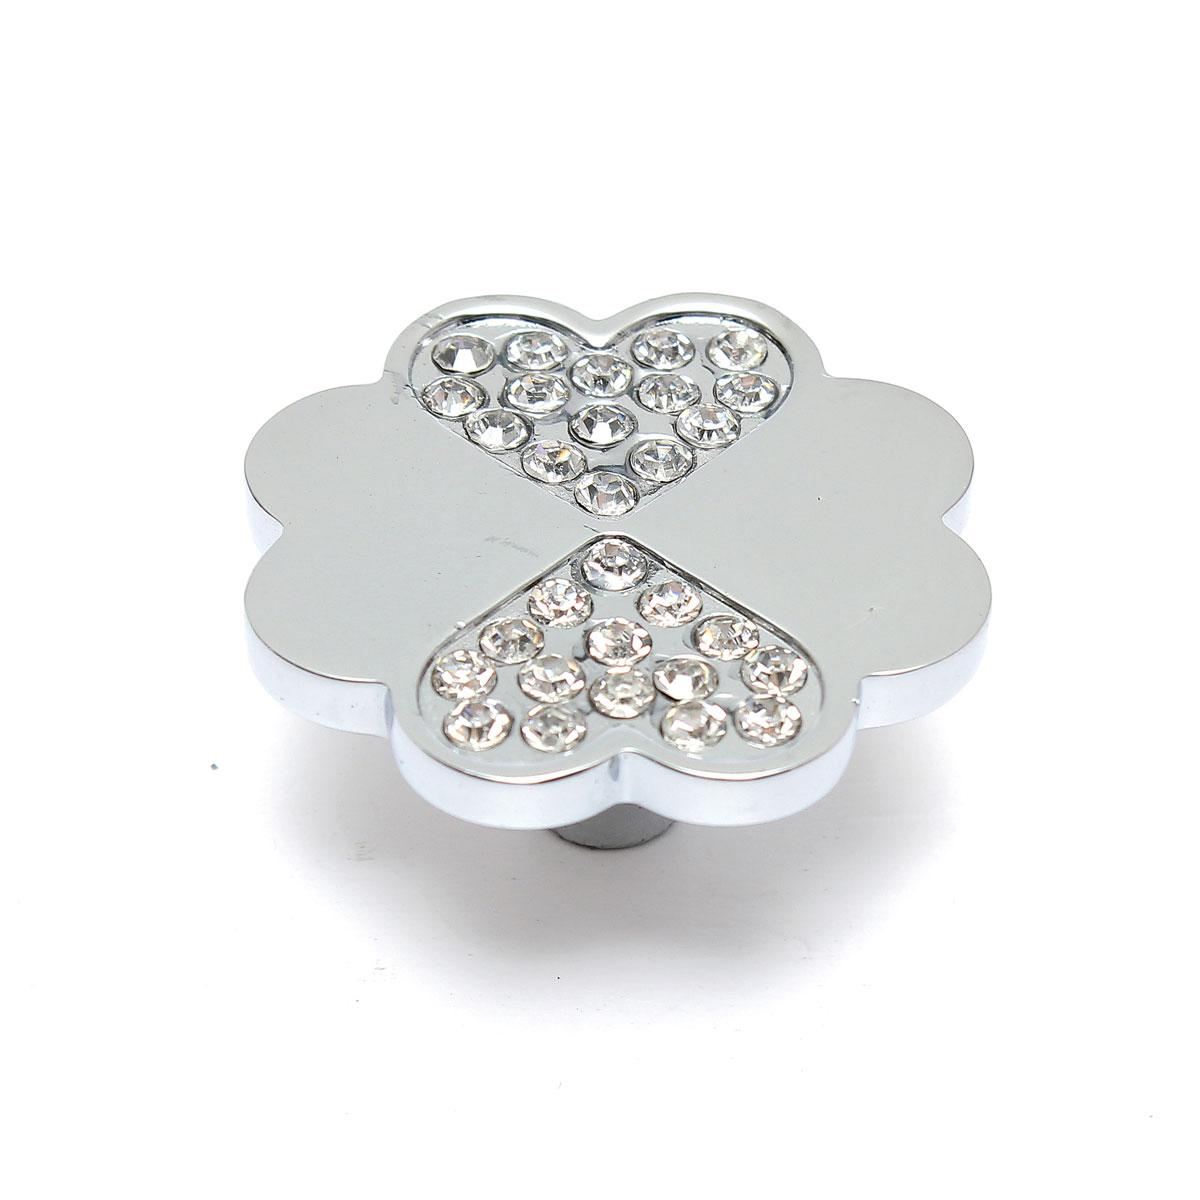 Zinc Alloy Pull Handles Knobs For Cabinet Cupboard Wardrobe Drawer Door Hardware Ebay